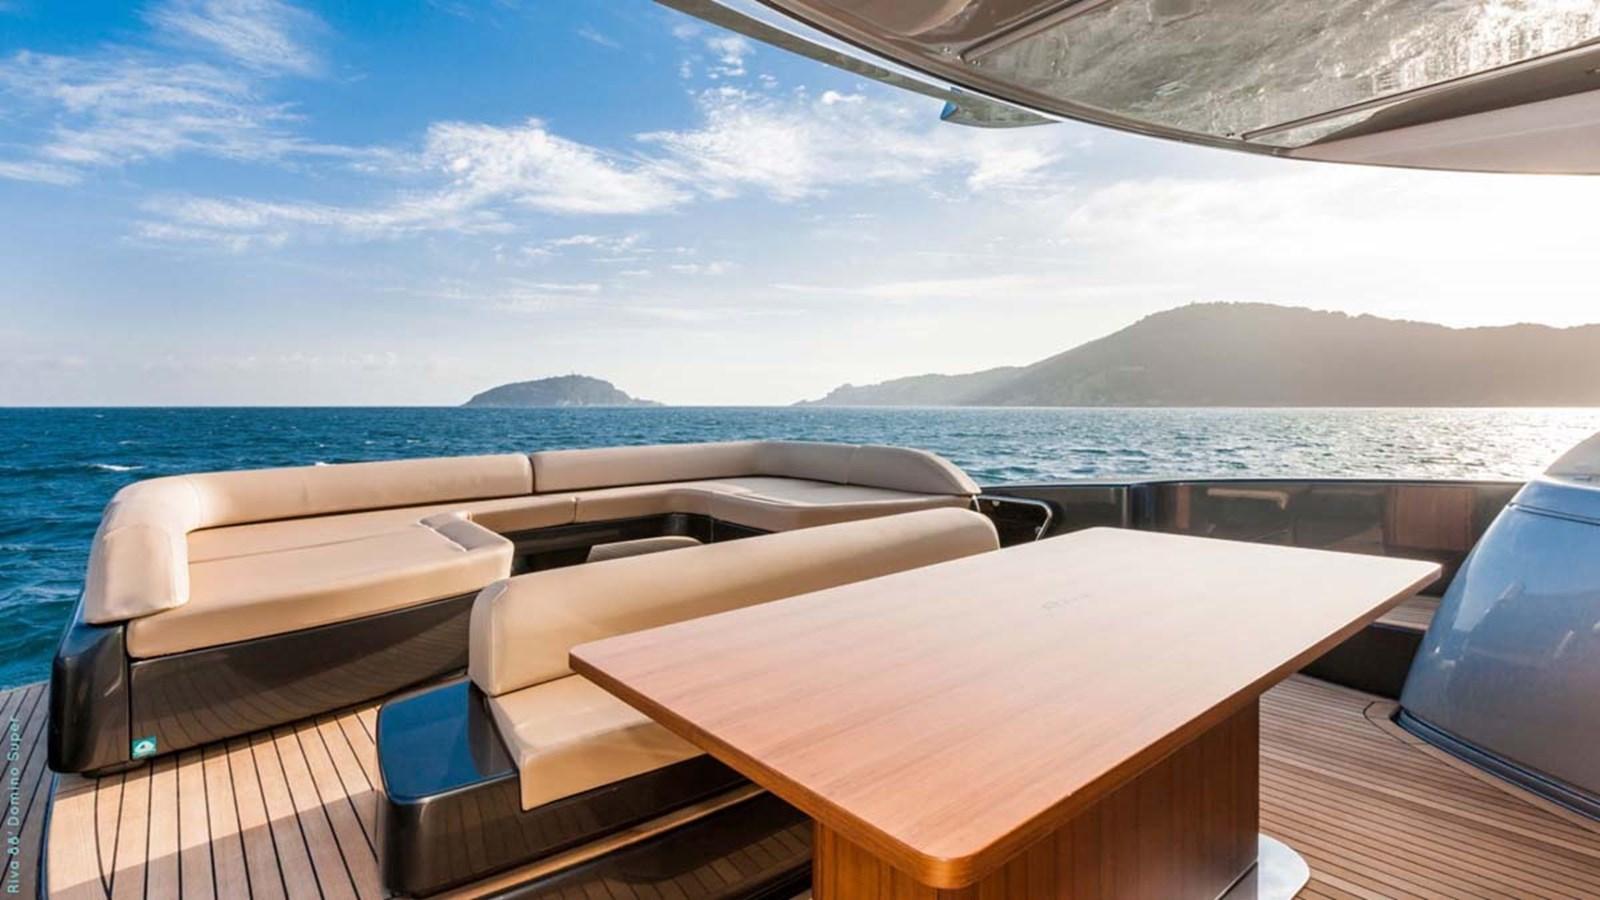 8705-Riva 88 Domino Super 2017 RIVAL YACHTS INC  Motor Yacht 2851233